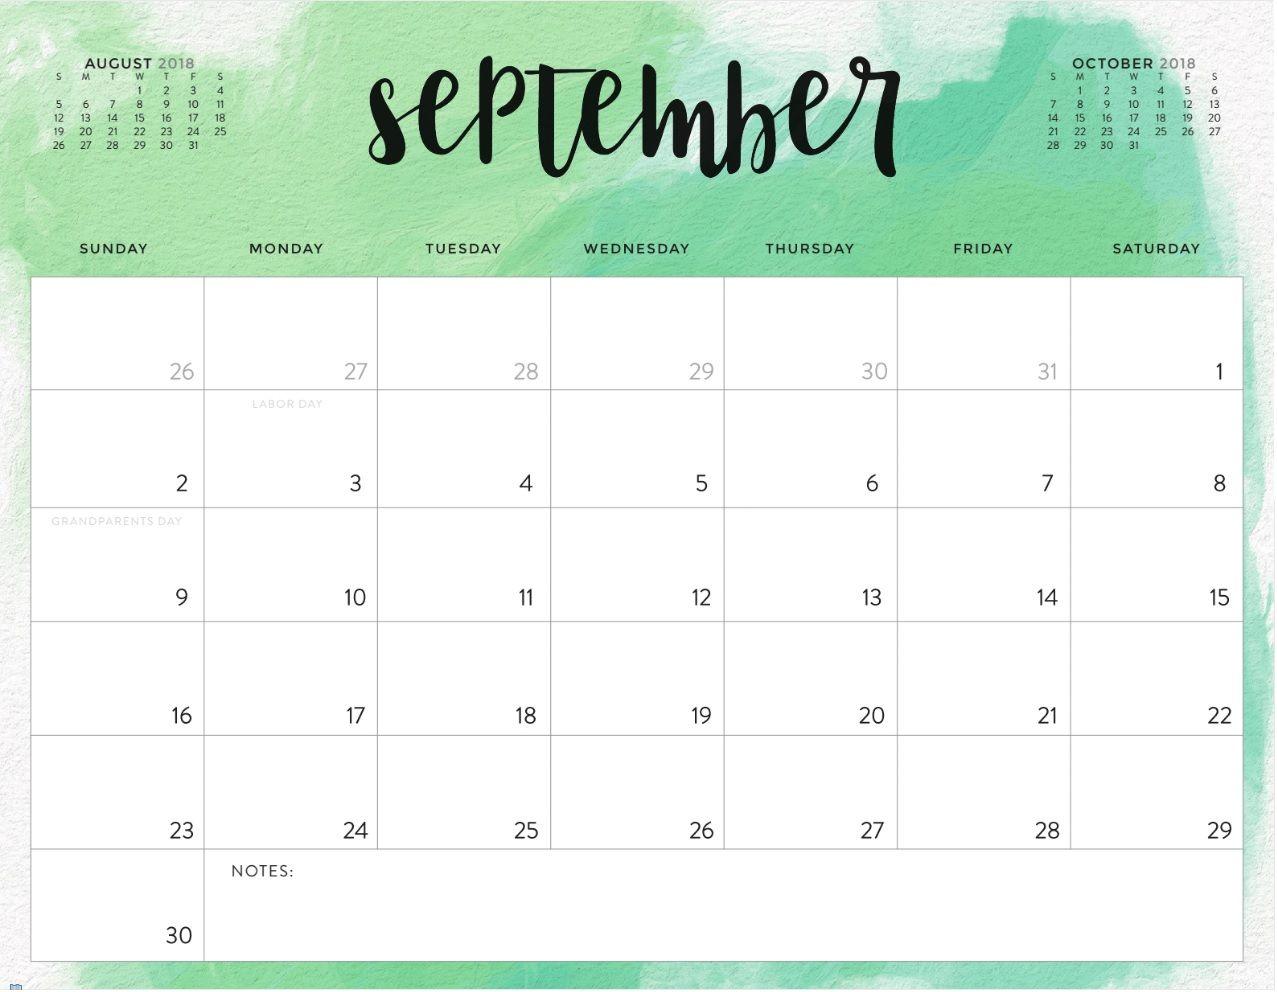 September 2018 Printable Calendar Waterproof | September calendar